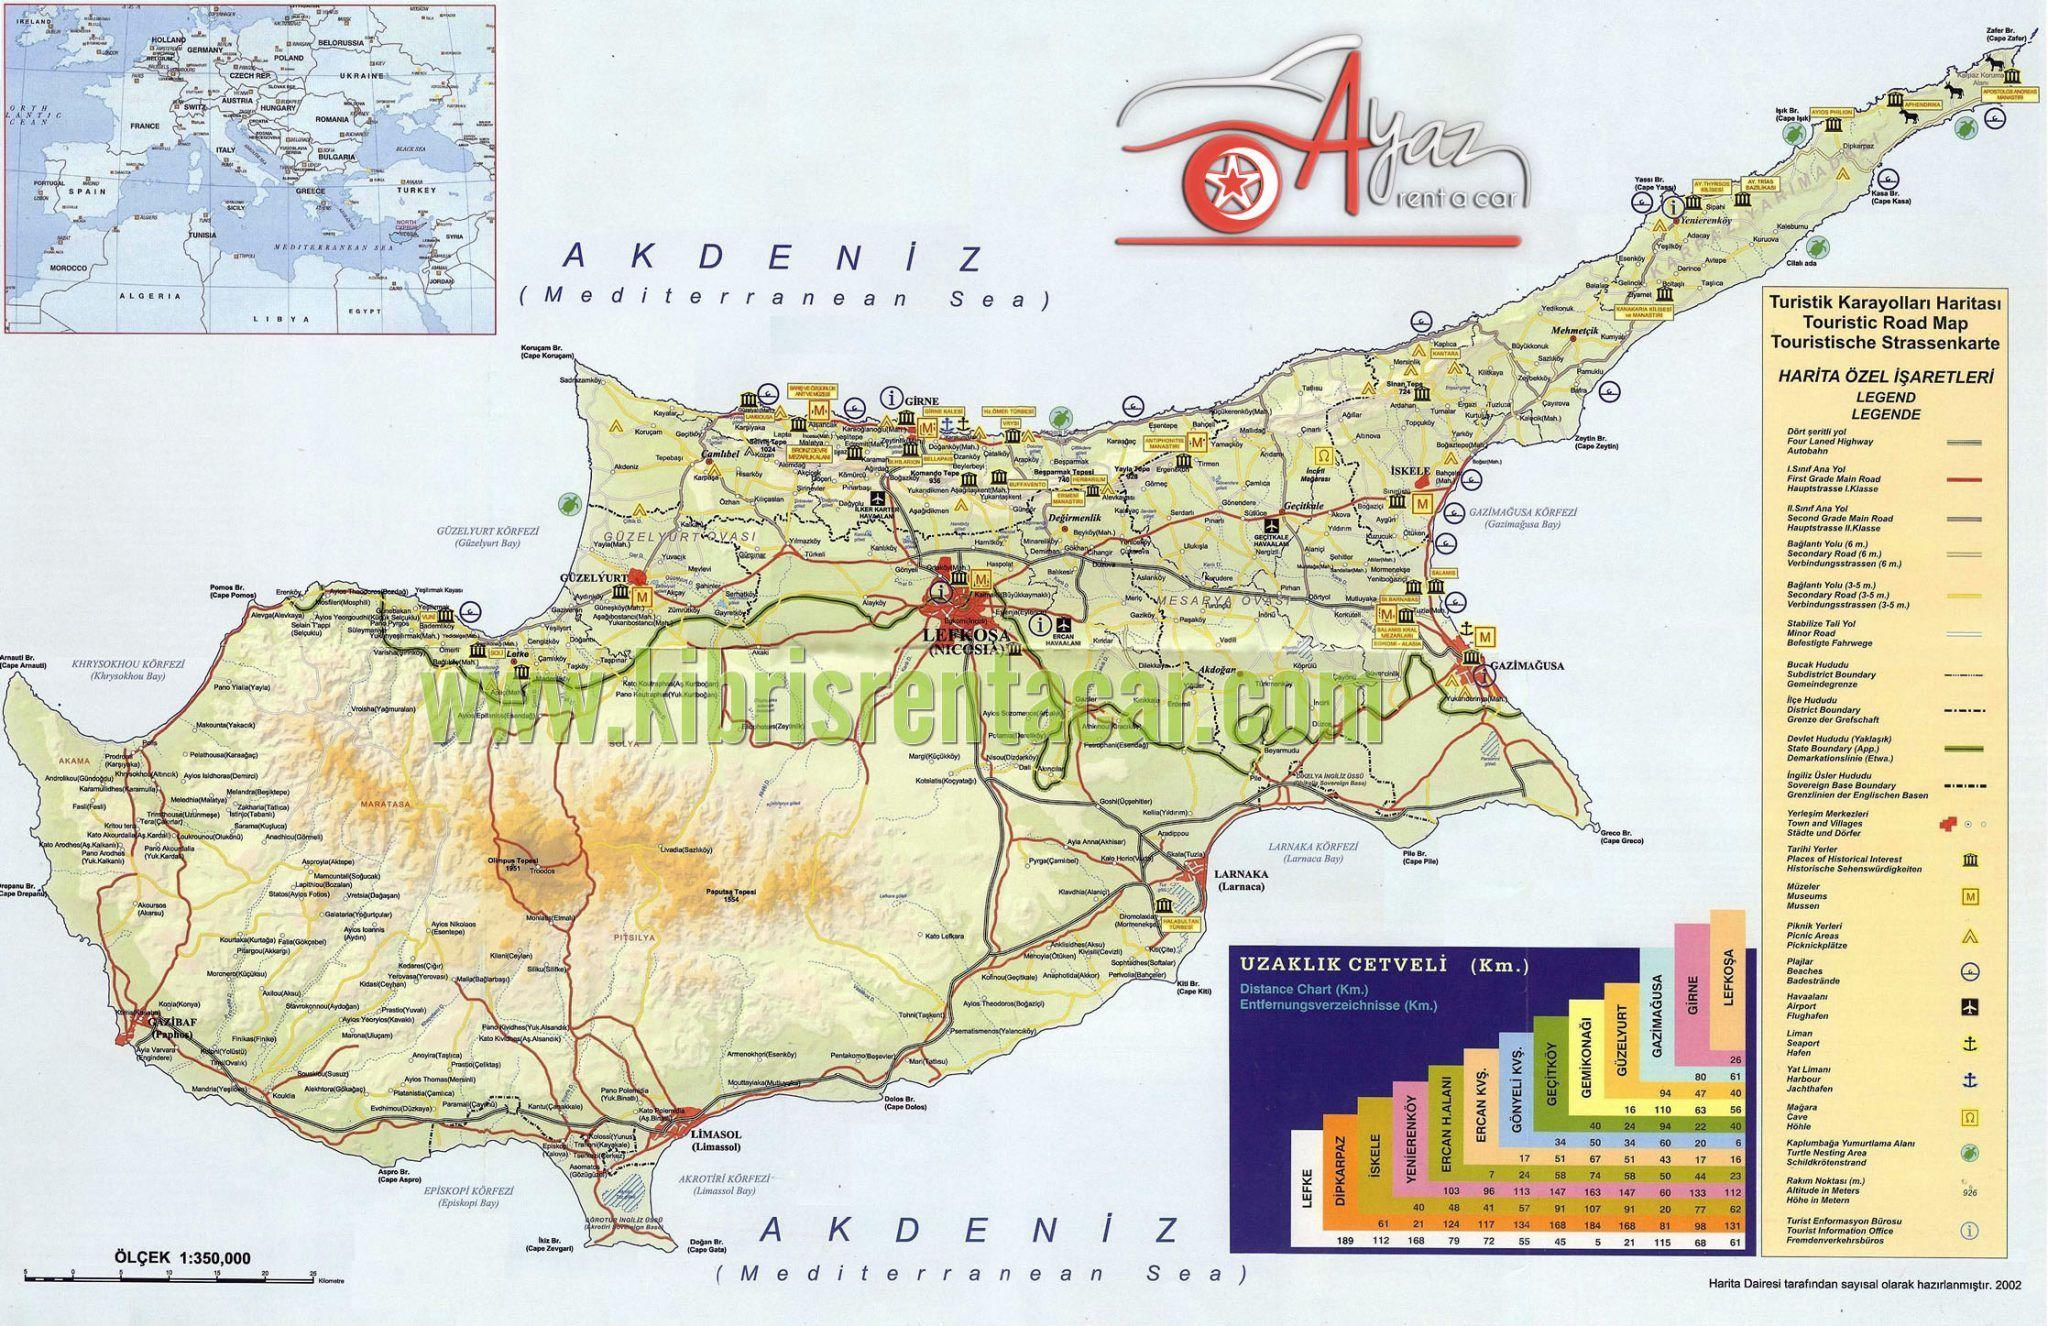 Kıbrıs Rent a Car, Kıbrıs Haritası